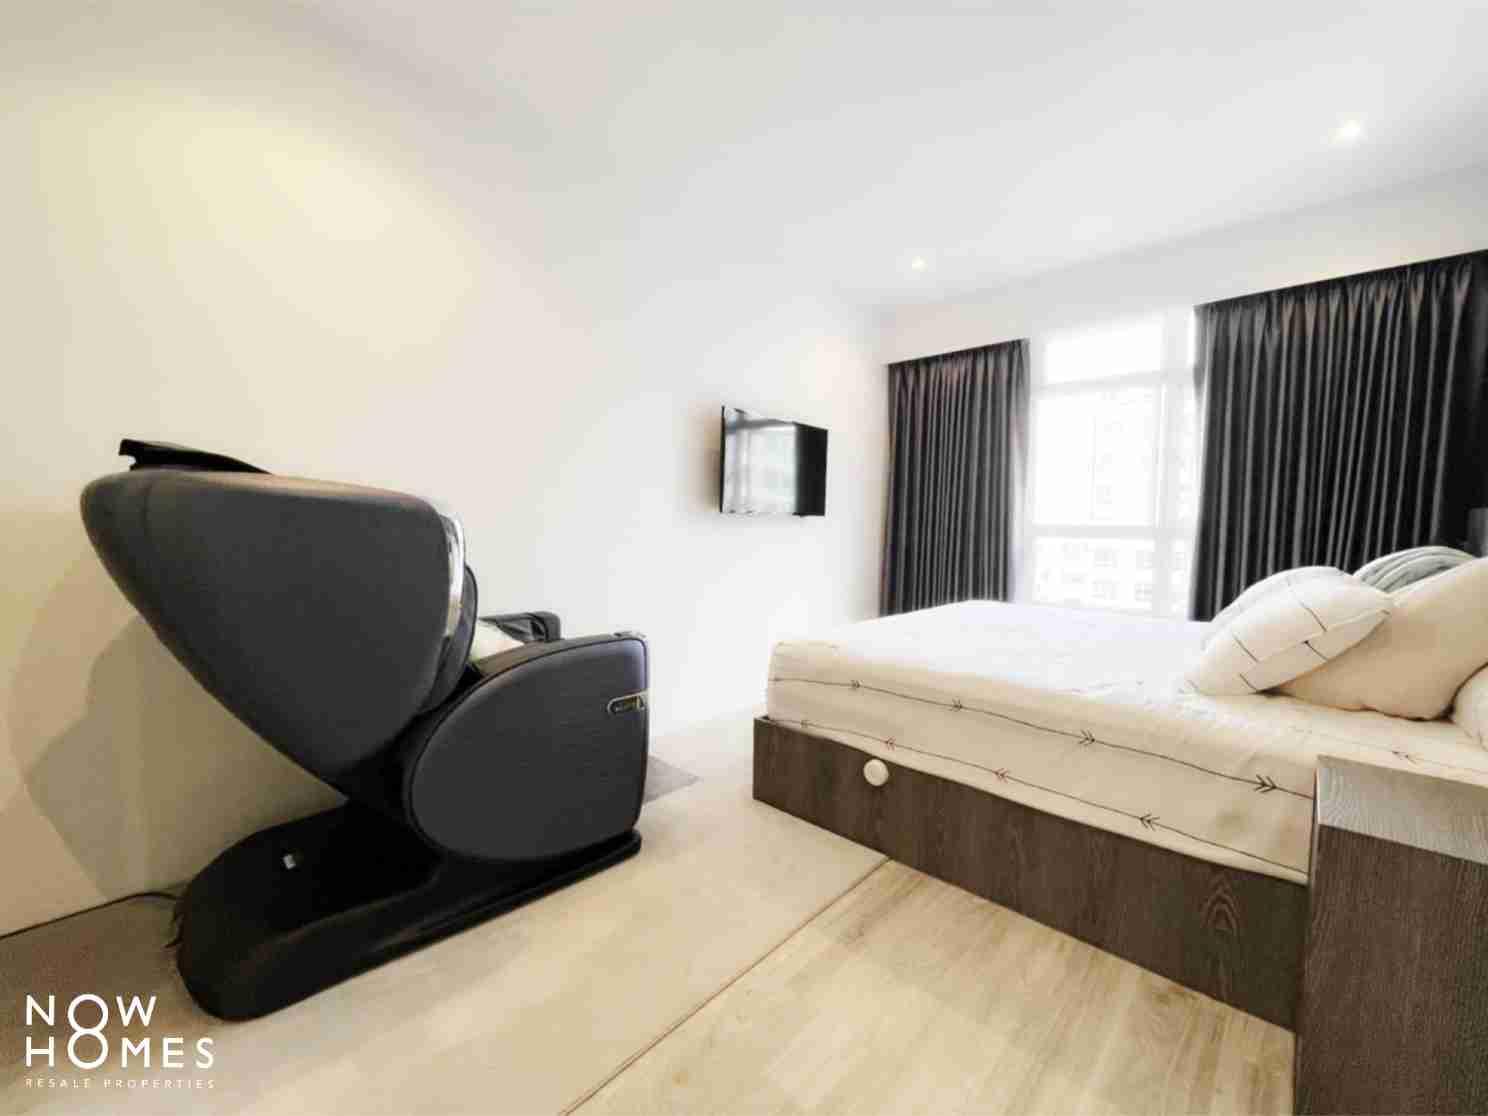 sengkang resale property - 288 compassvale - Masterbed room